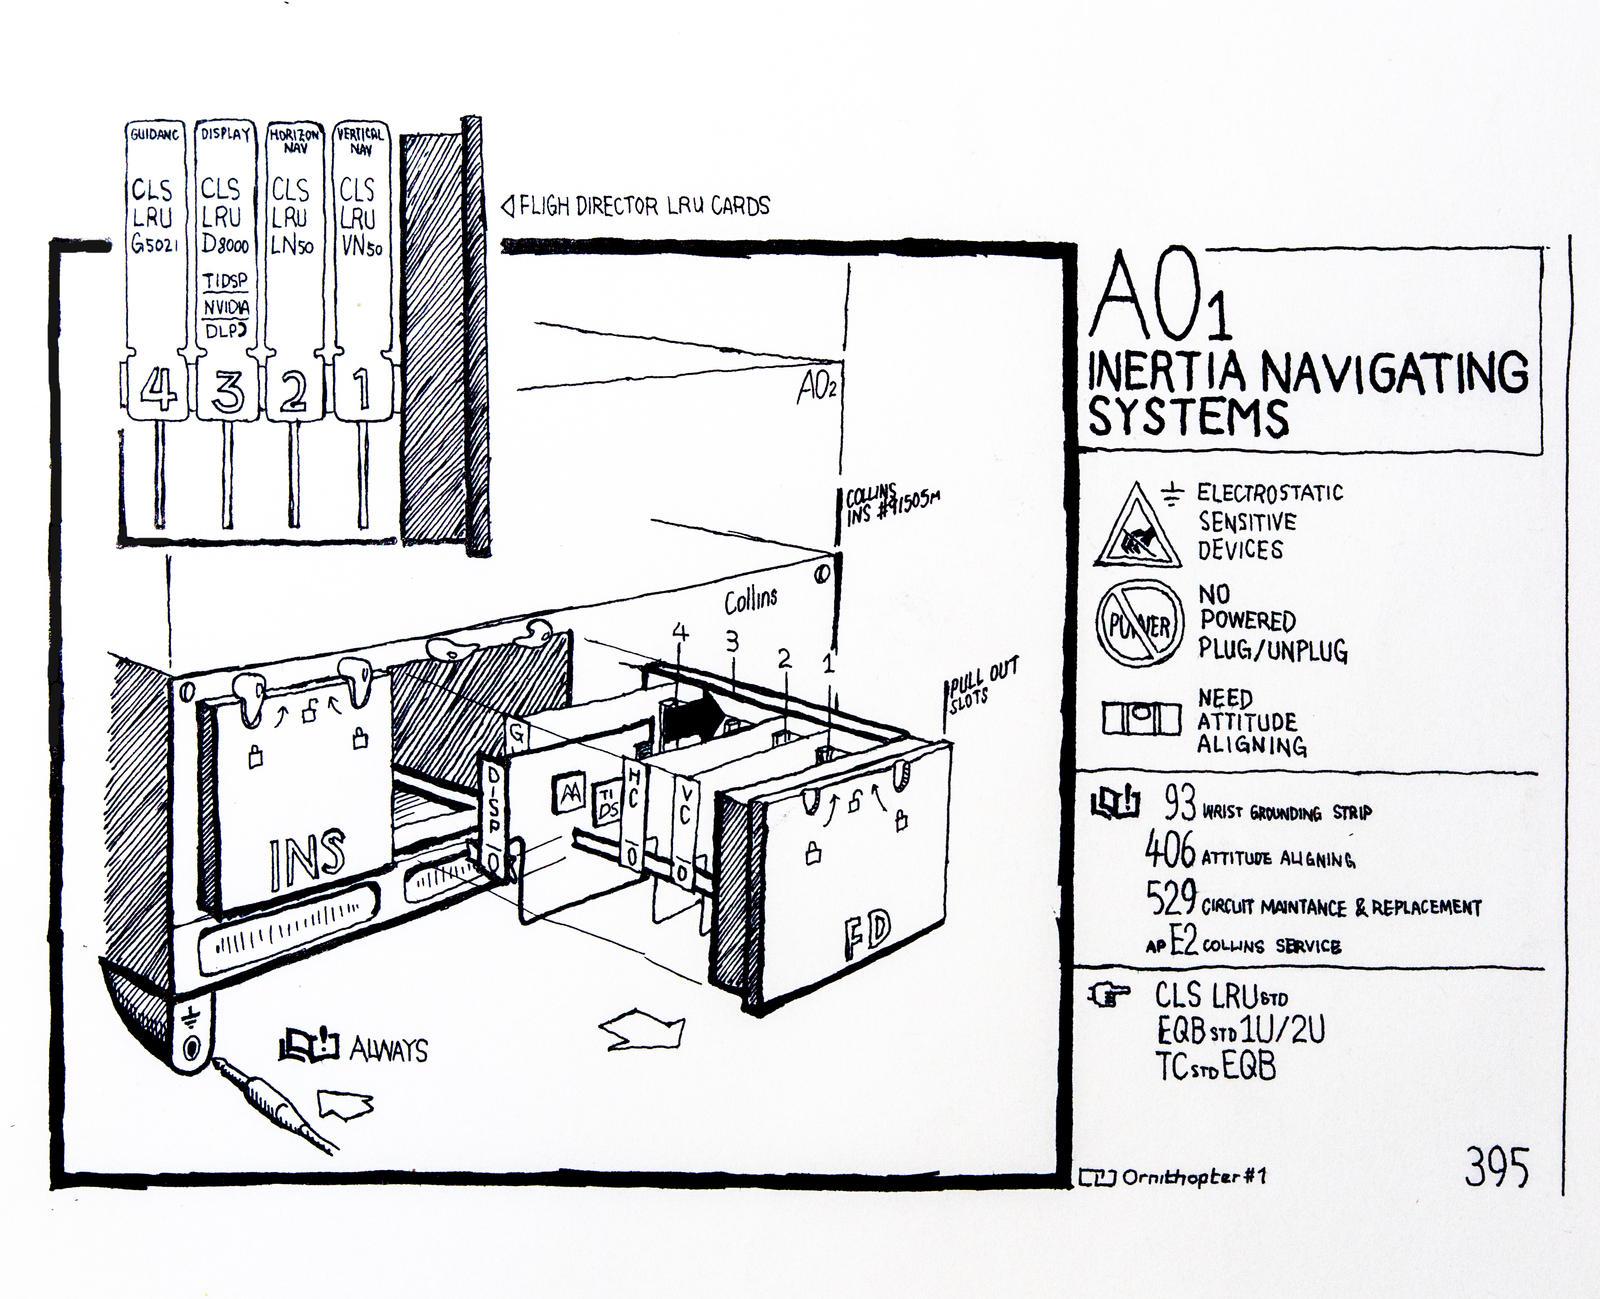 maintenance manual page395 by nicksbest on deviantart